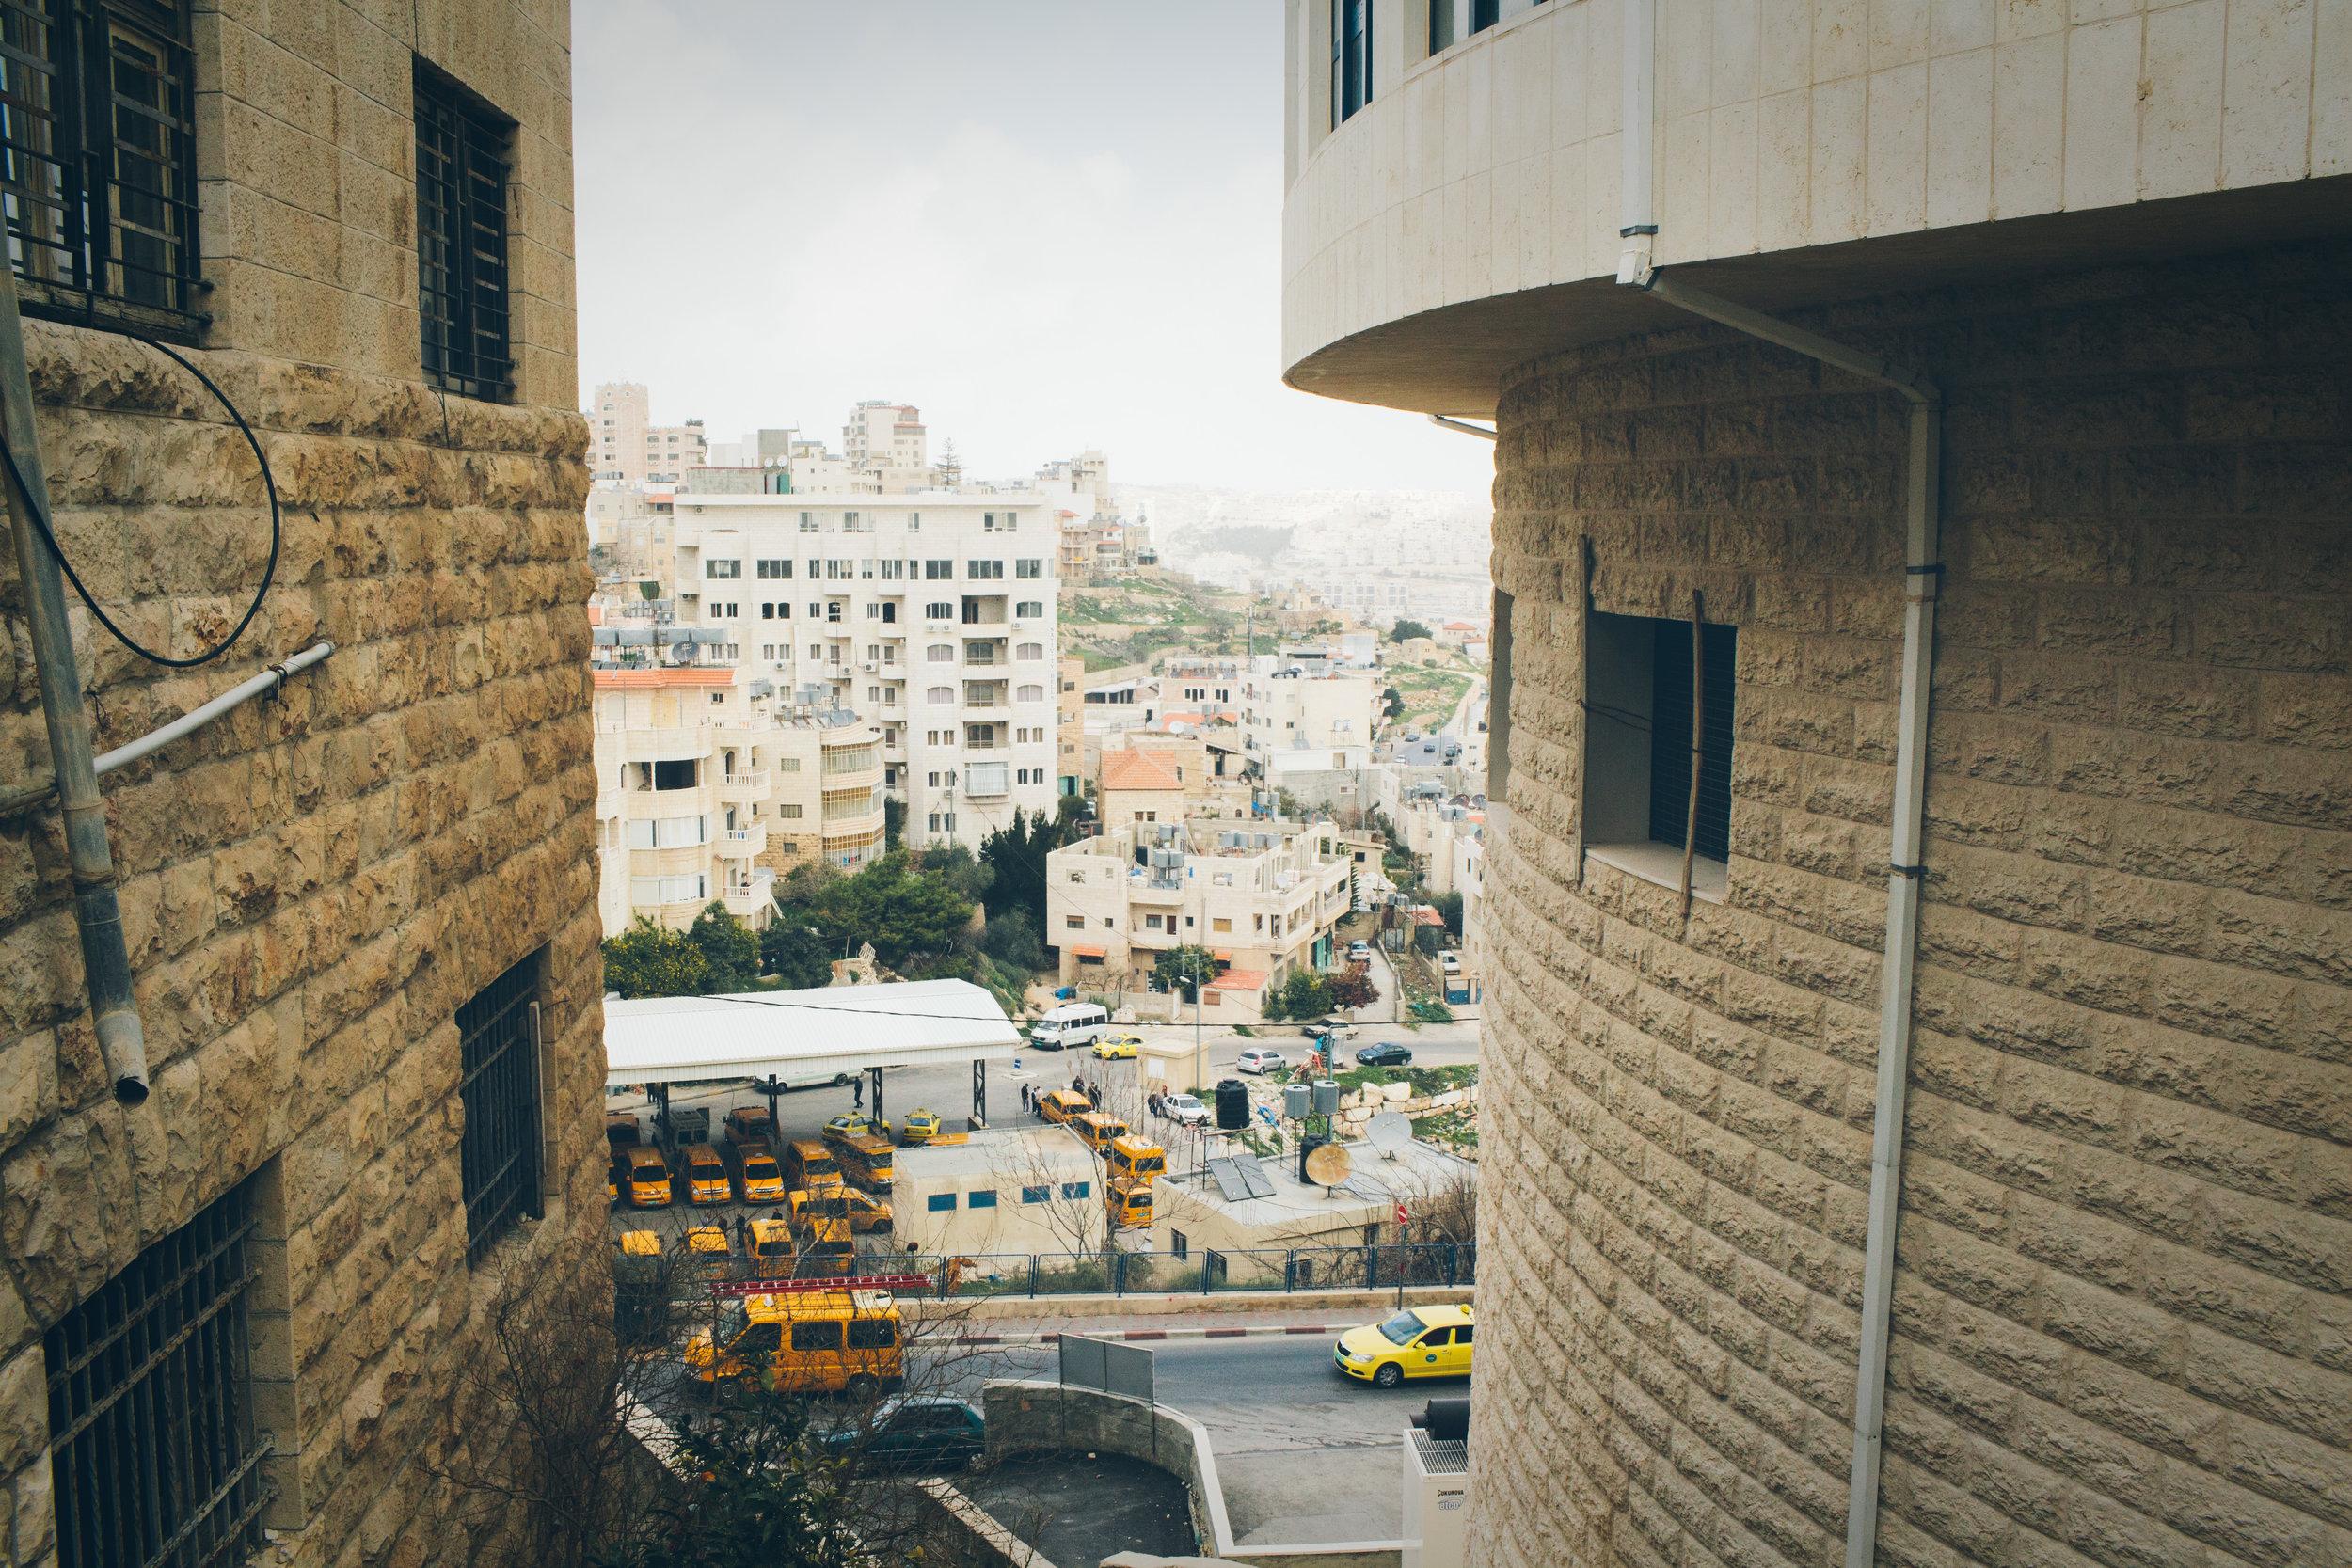 ISRAEL-JERUSALEM-NYC-CYNTHIACHUNG-0790.jpg